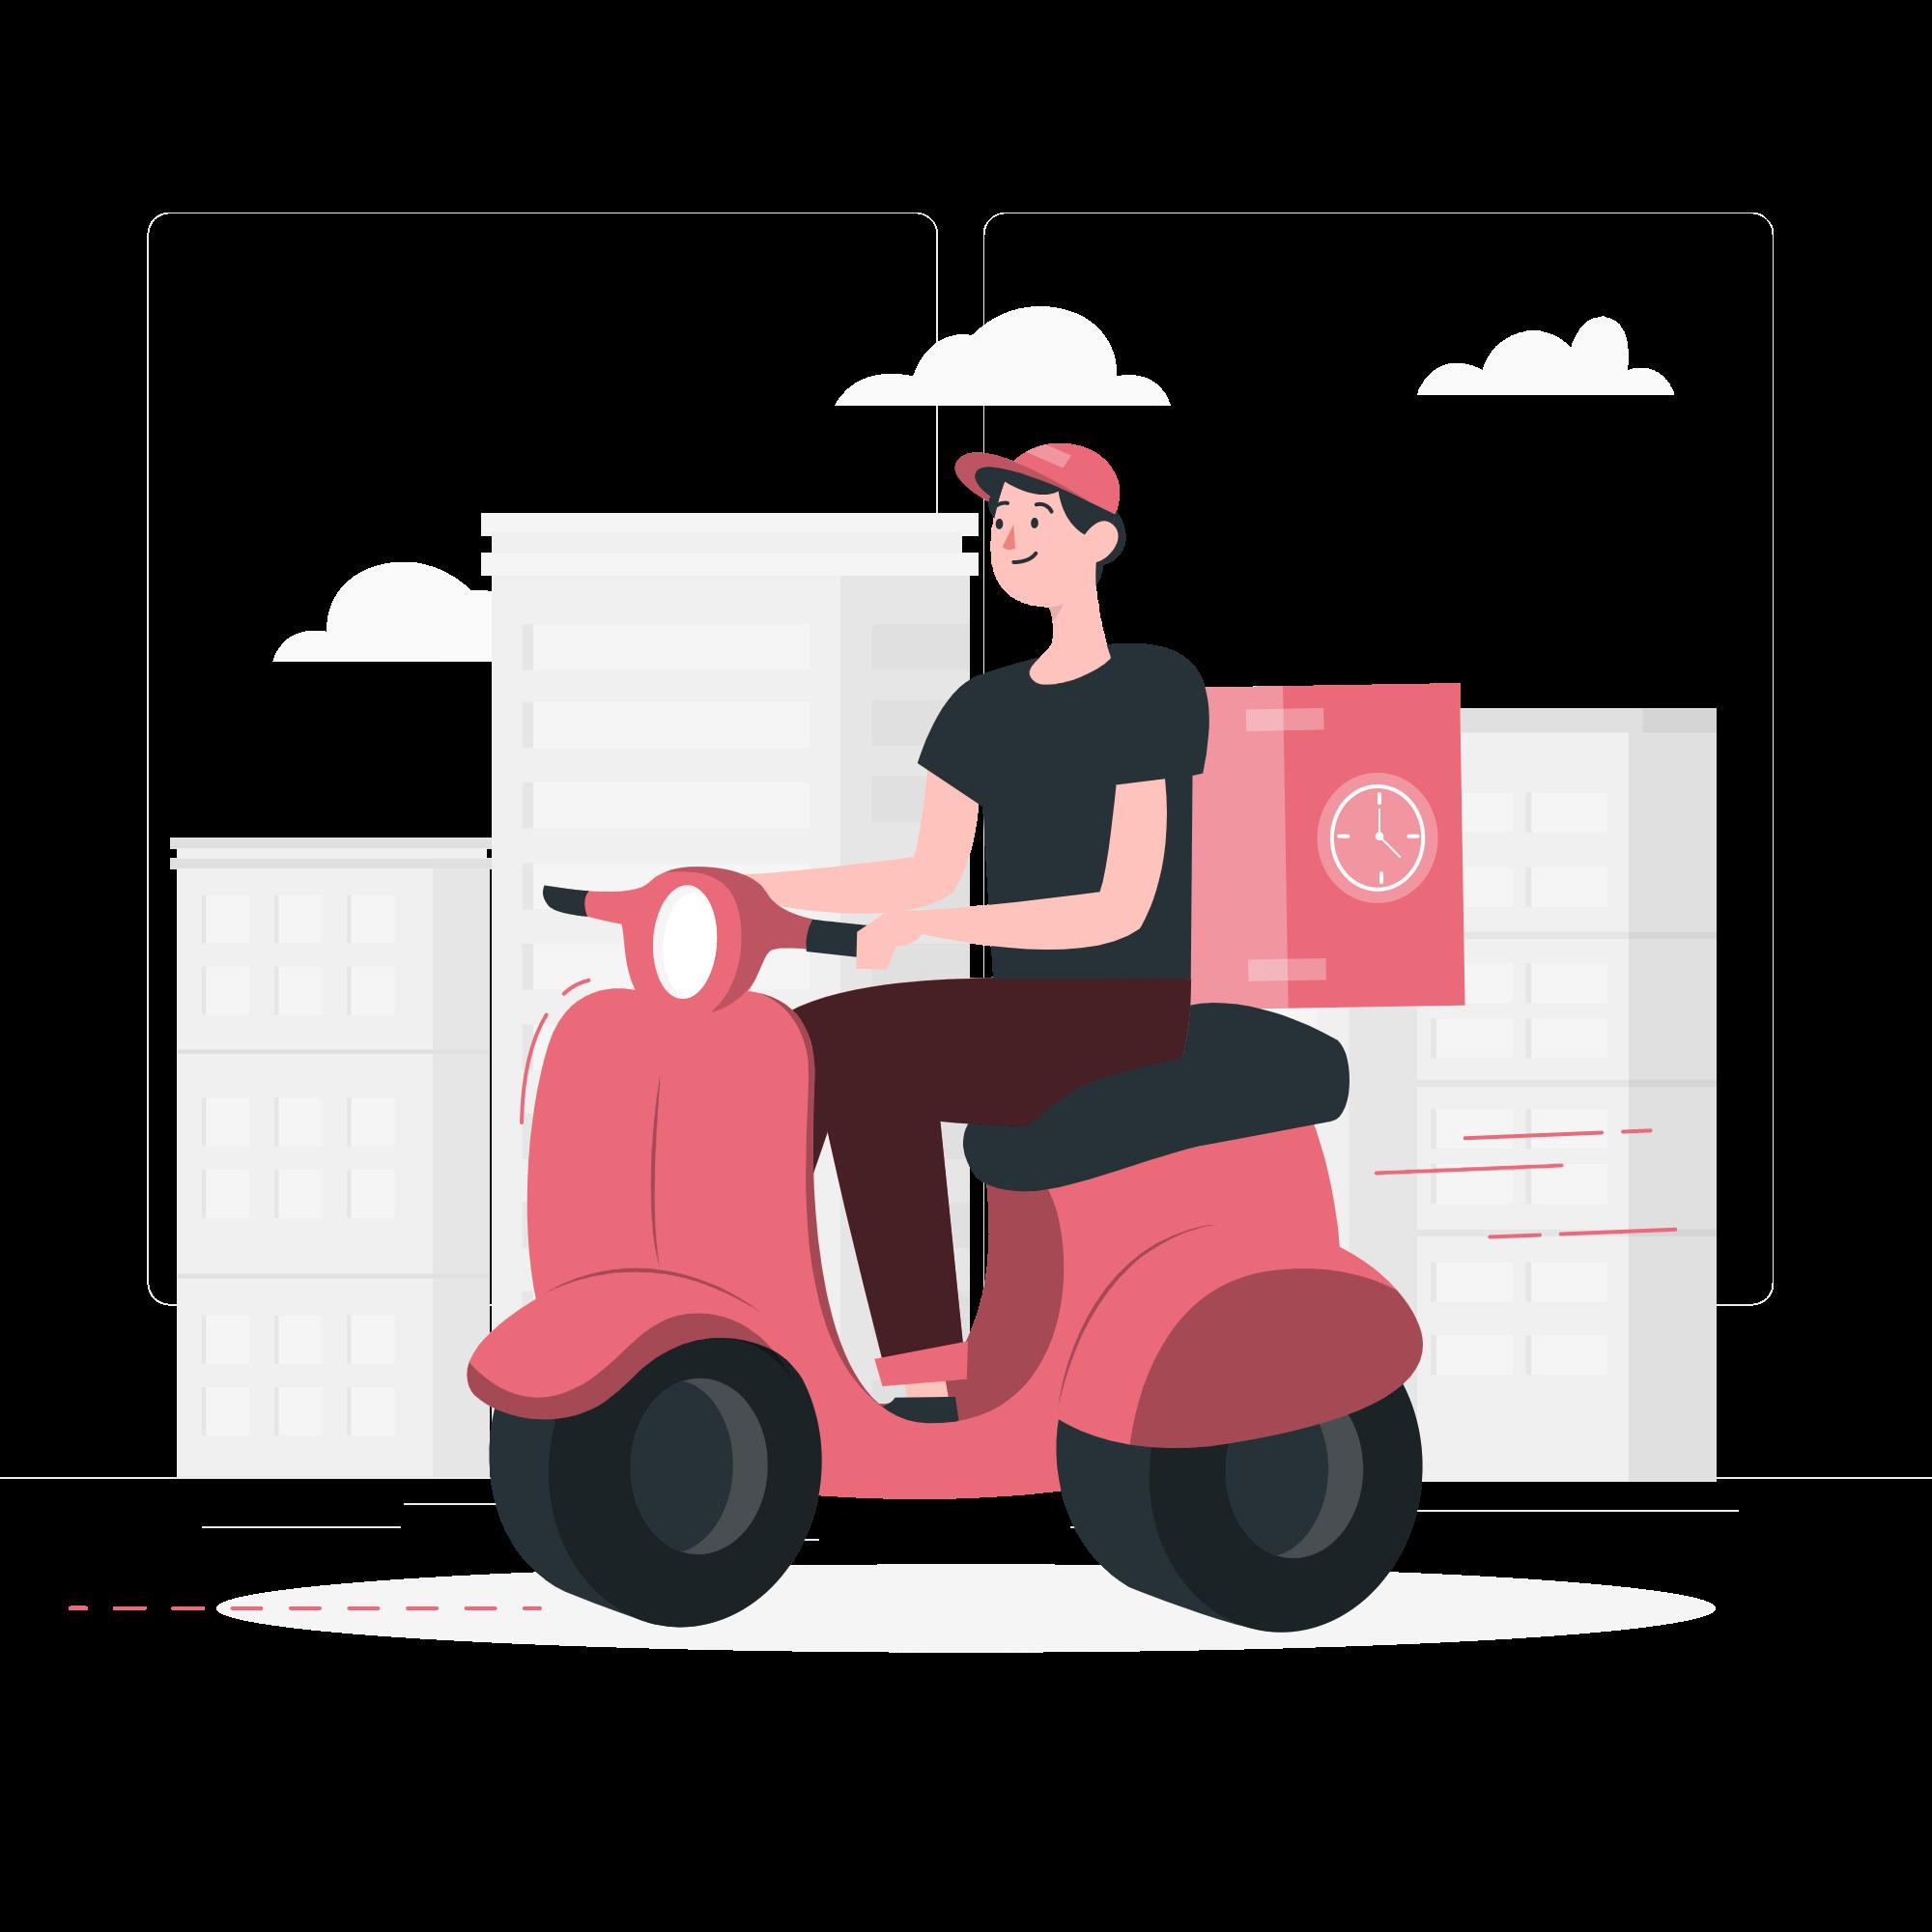 Delivery ilustration